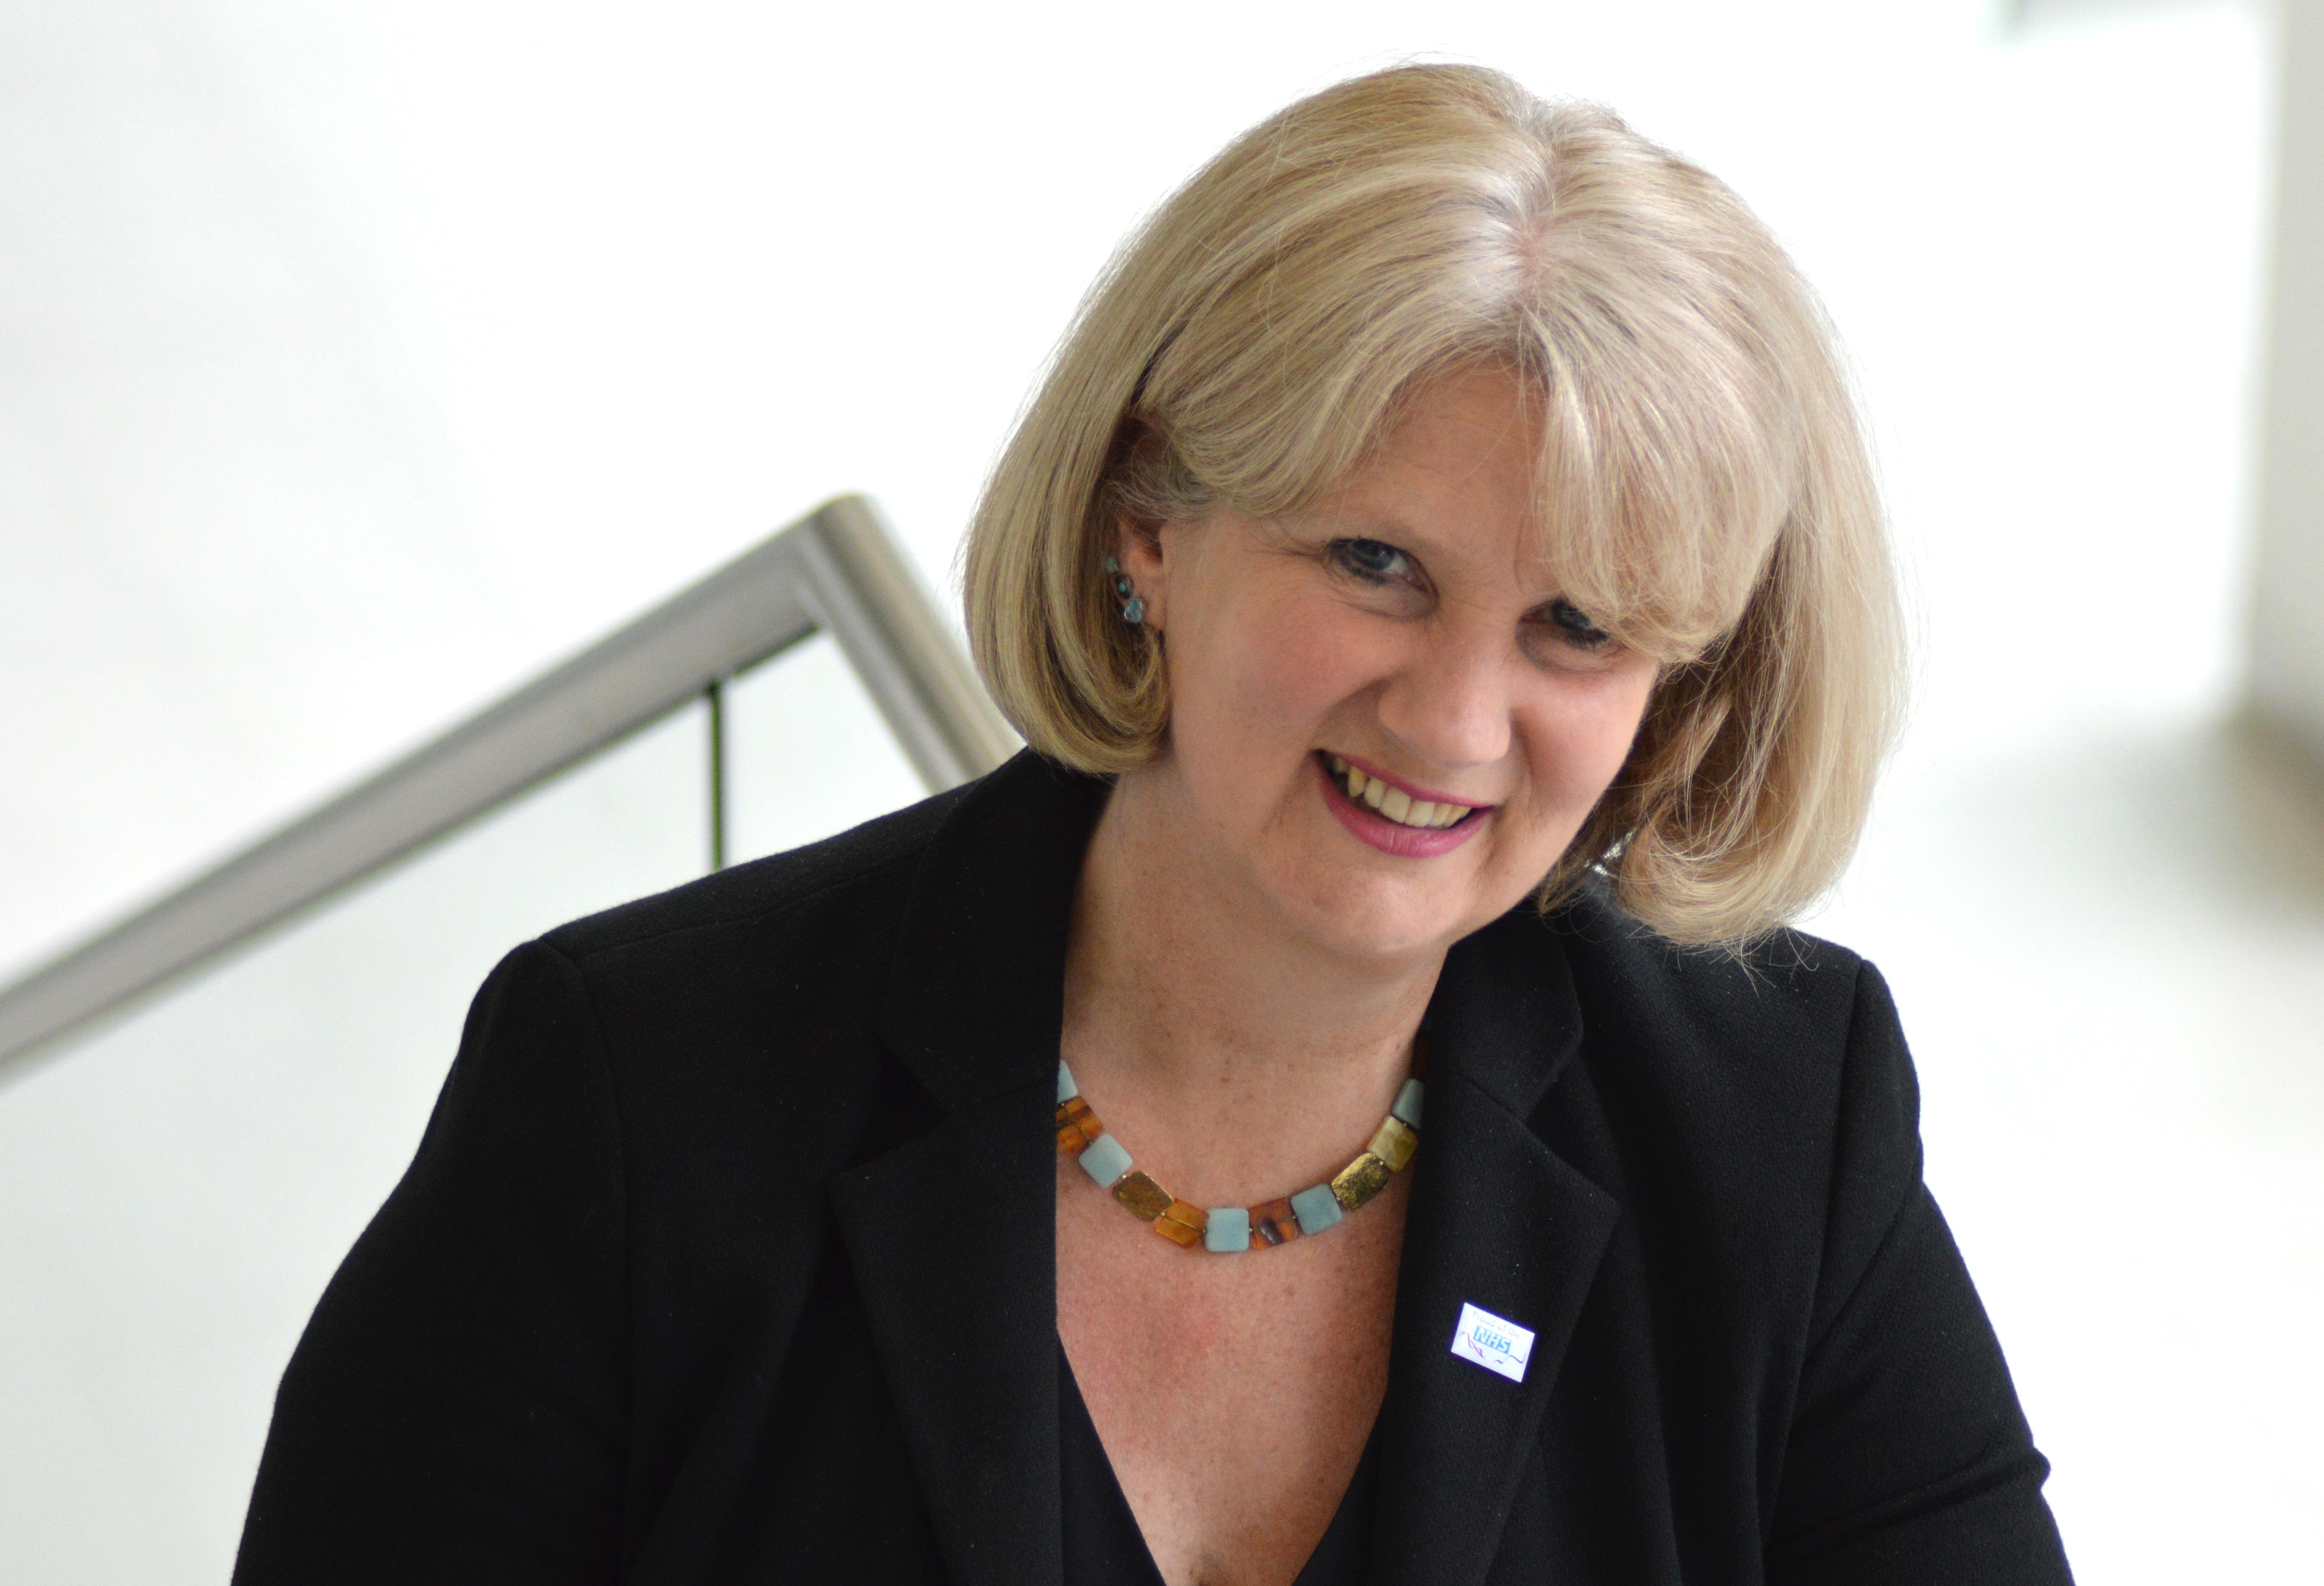 Claire Murdoch